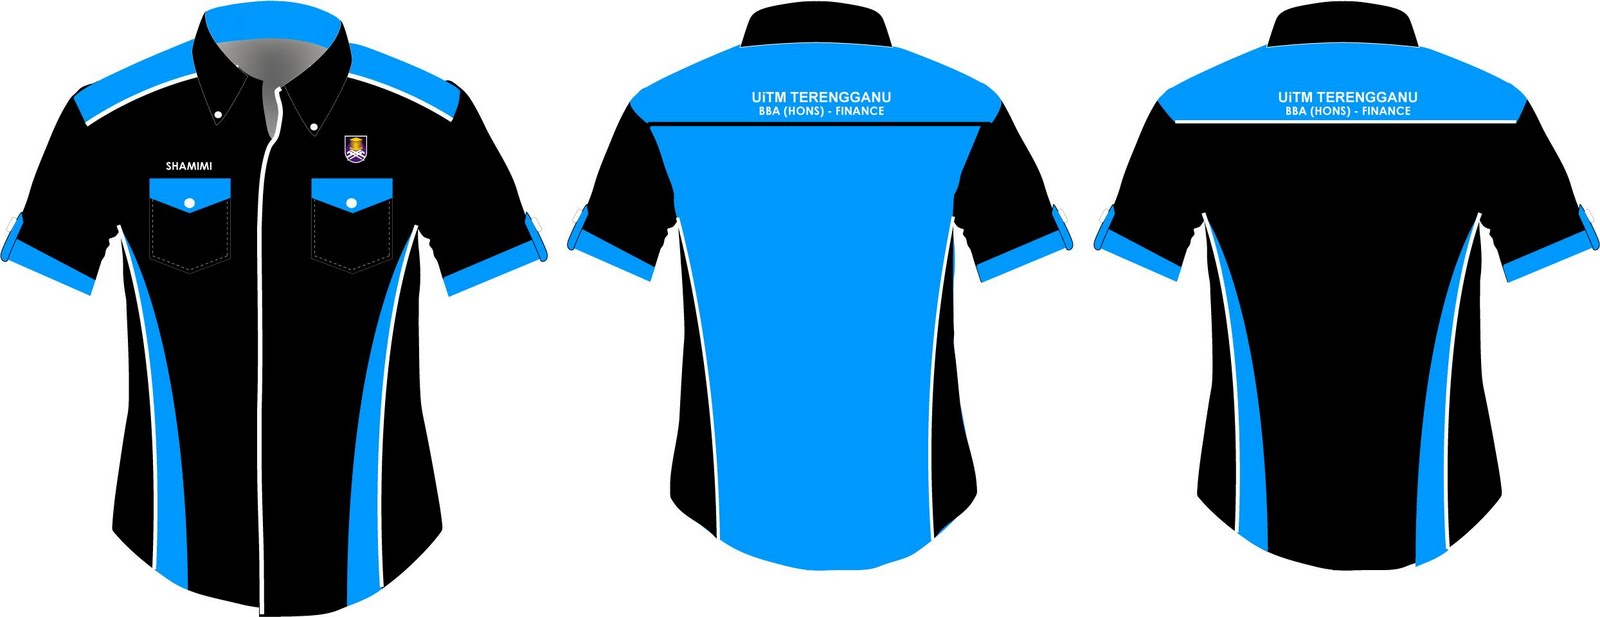 contoh design kemeja baju katalog